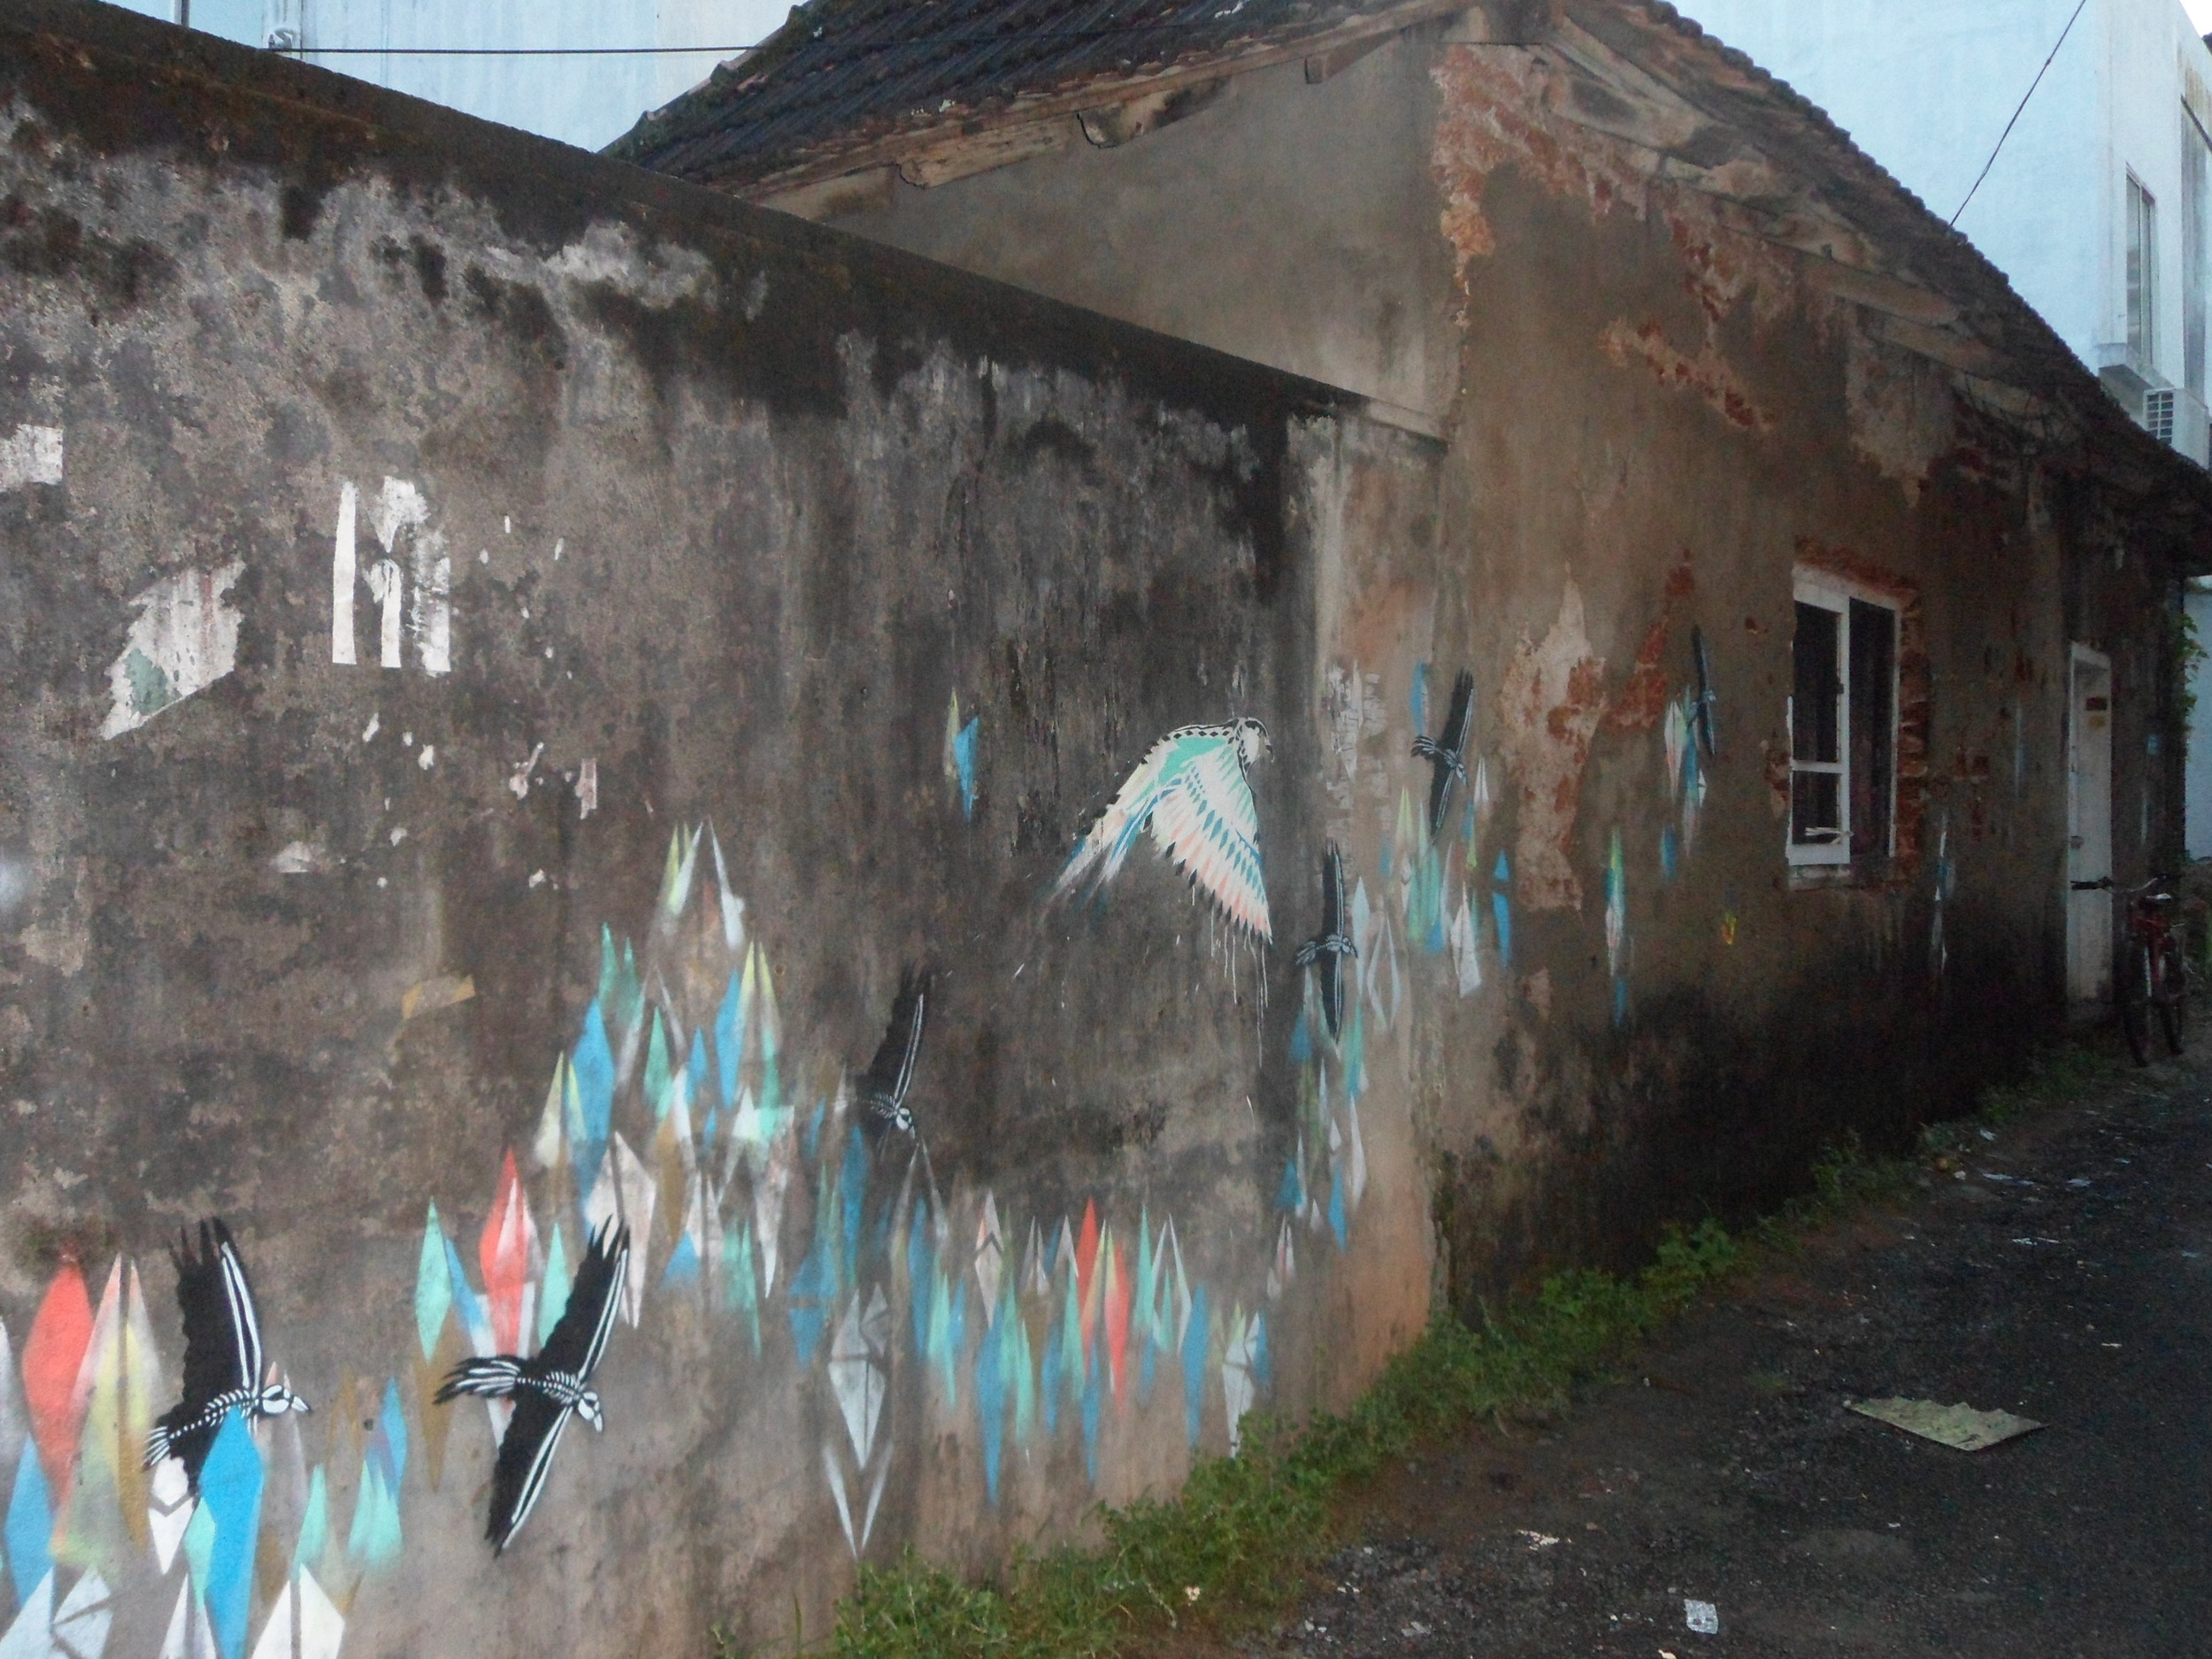 street-art-fort-kochi-india-5